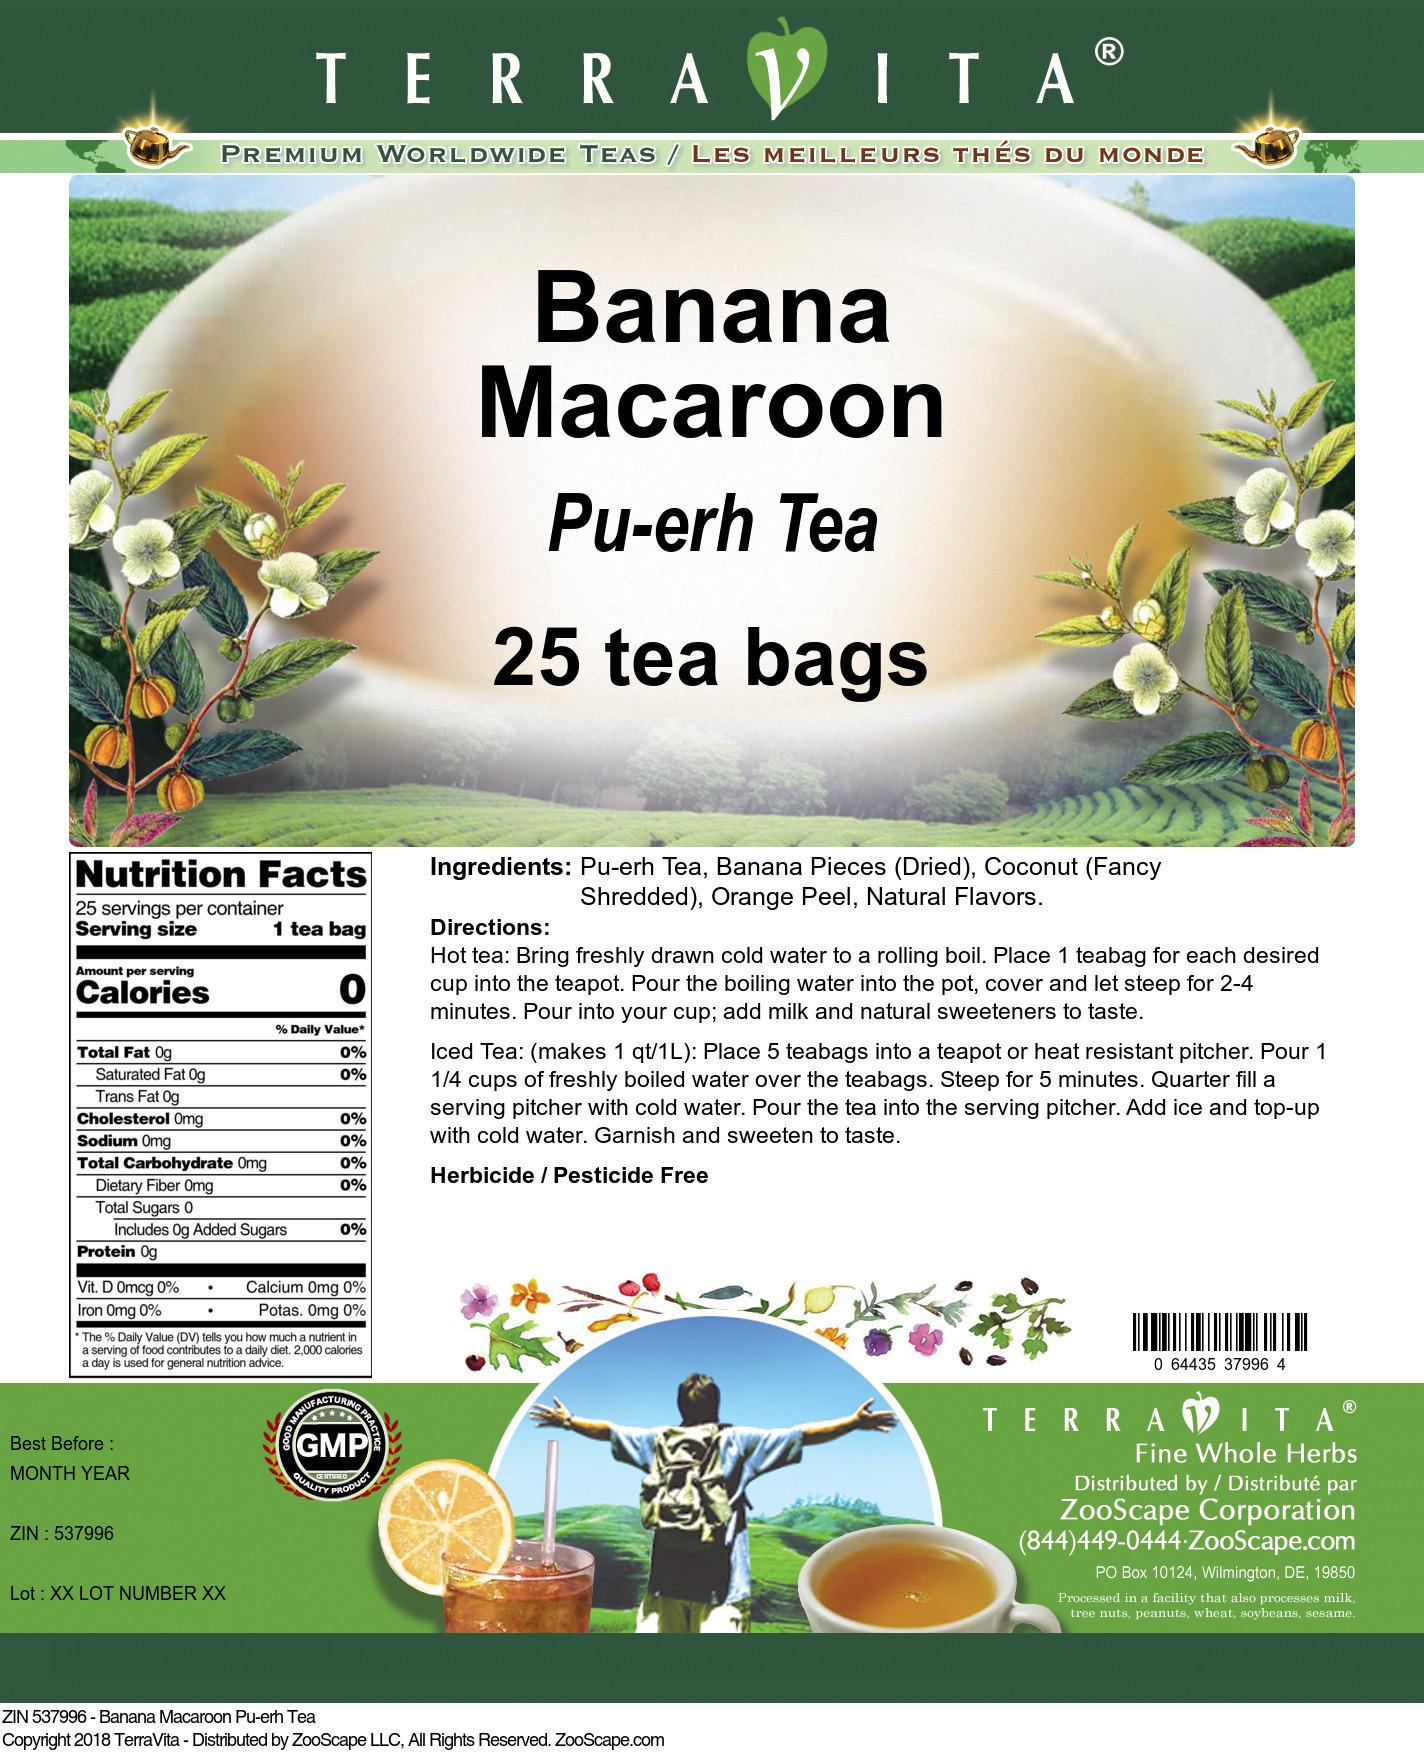 Banana Macaroon Pu-erh Tea